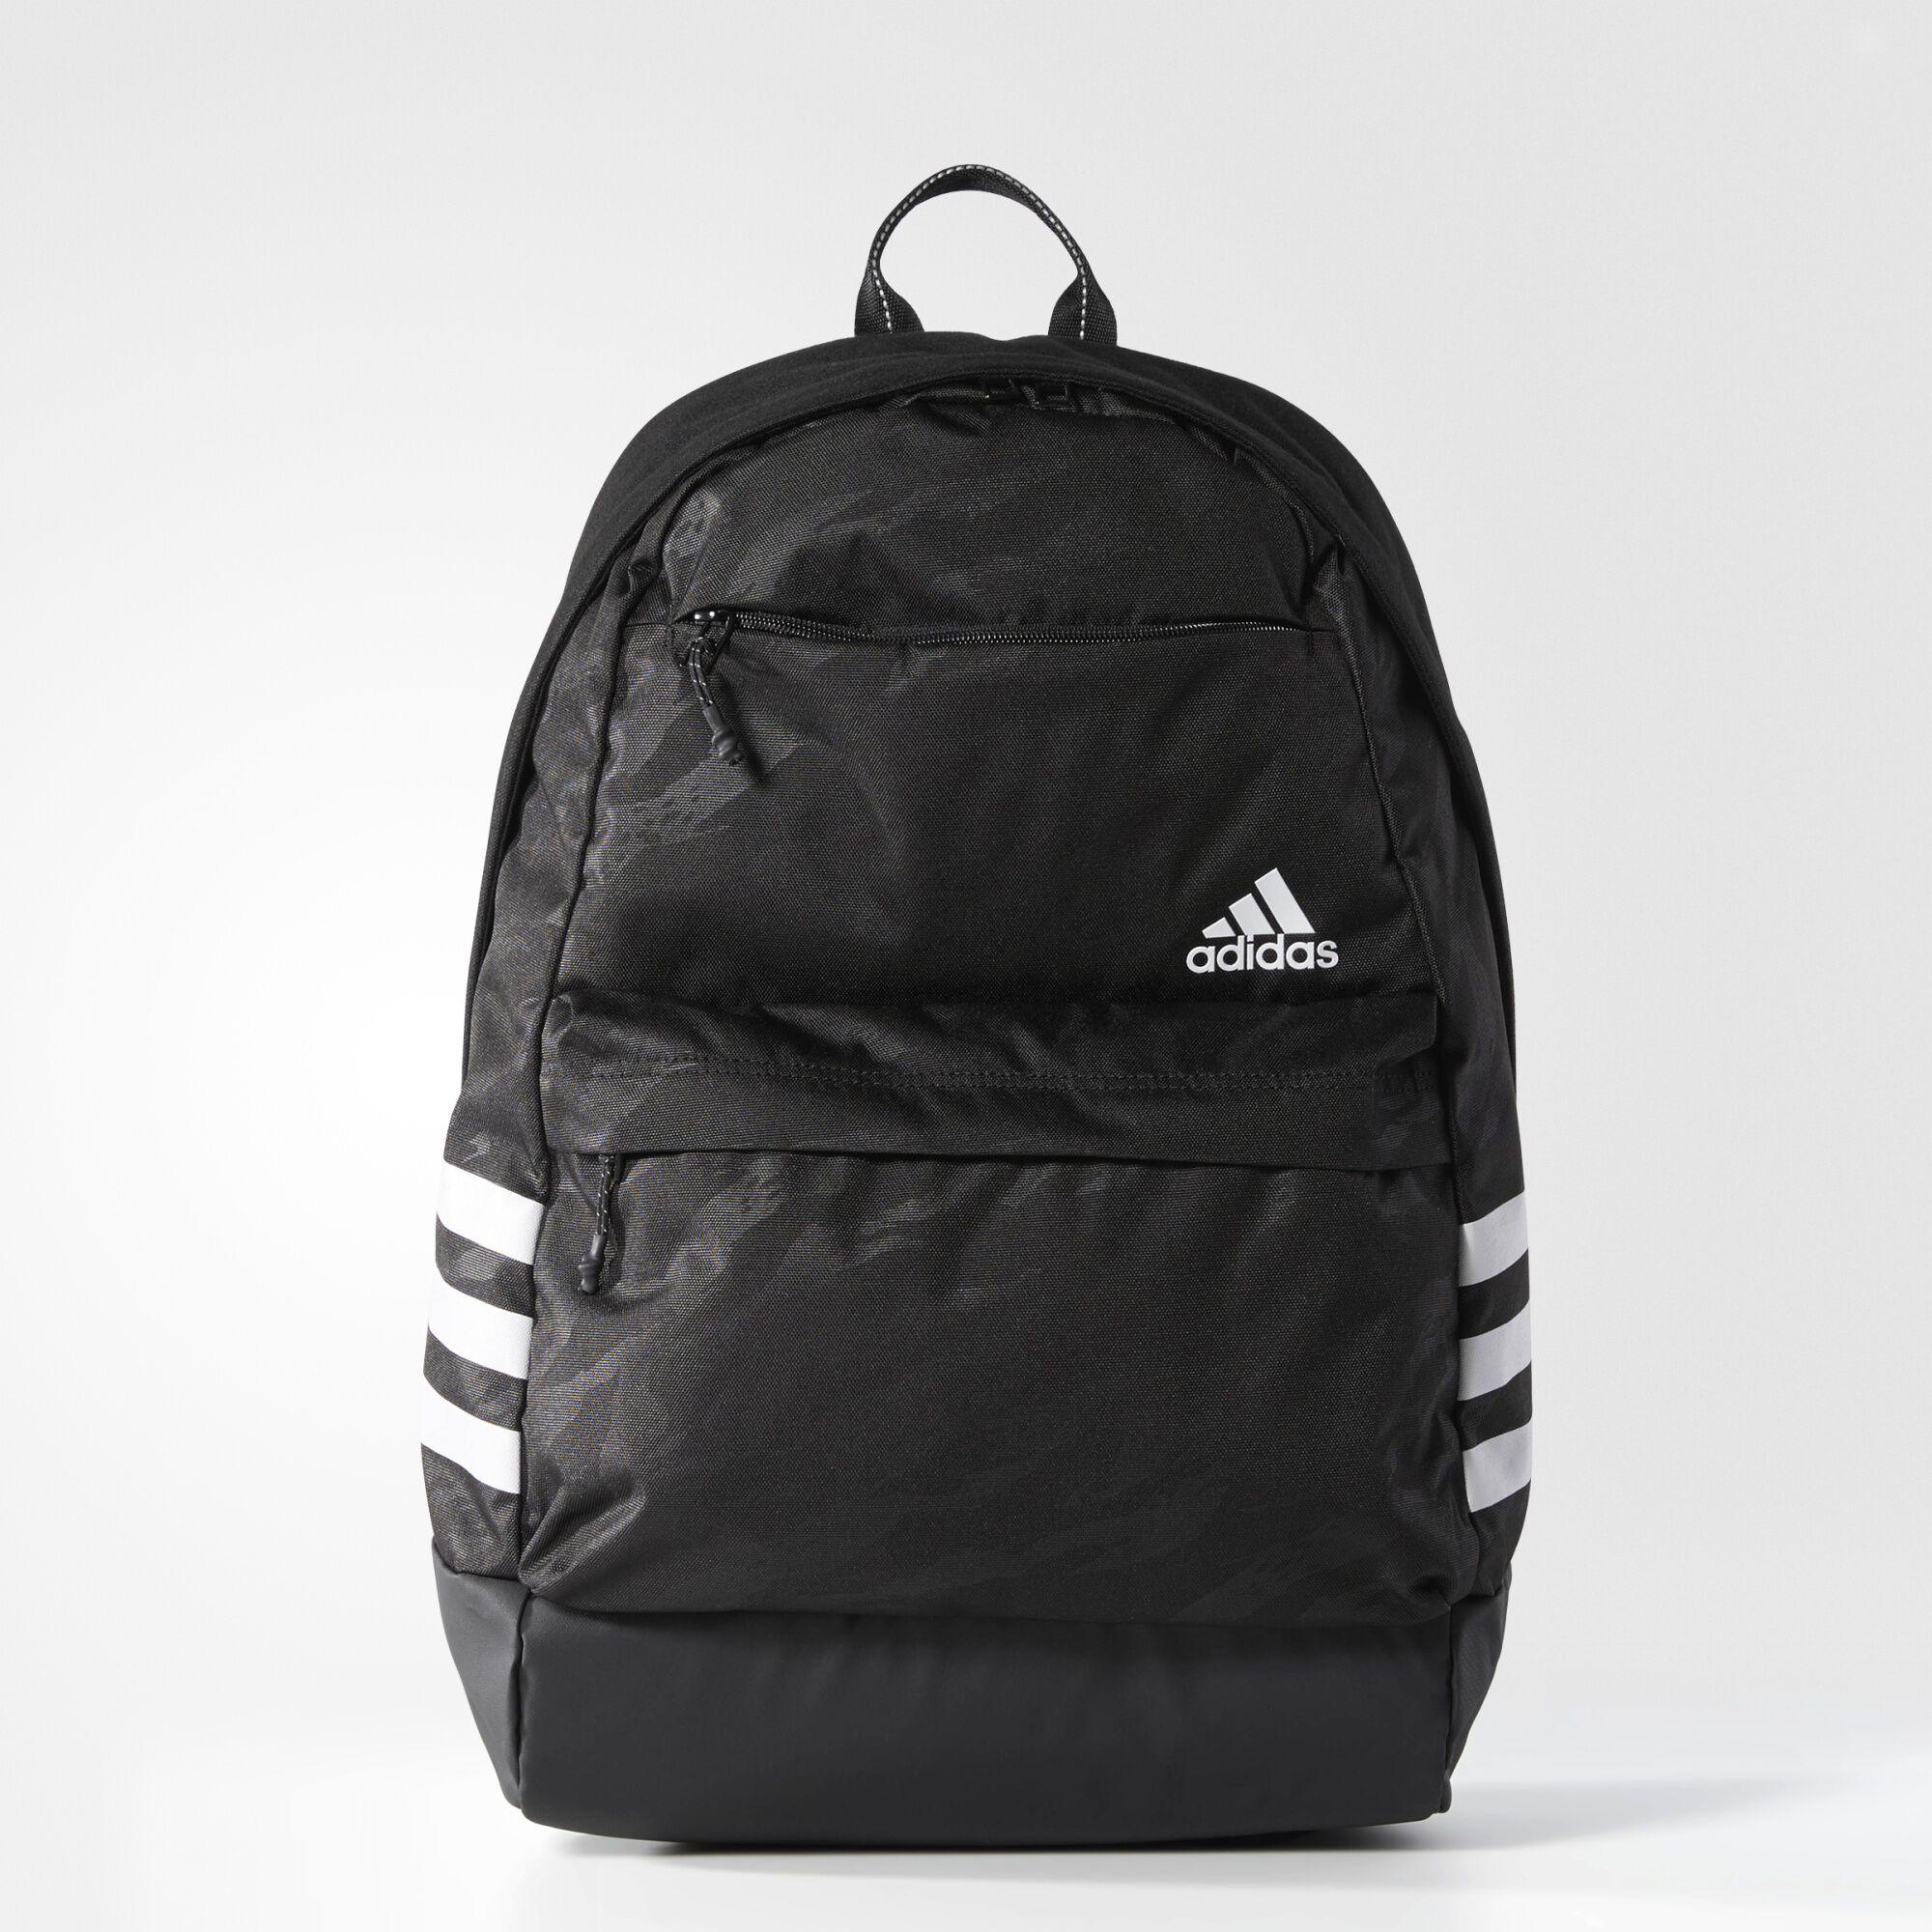 womens gym bags backpacks duffle bags adidas us